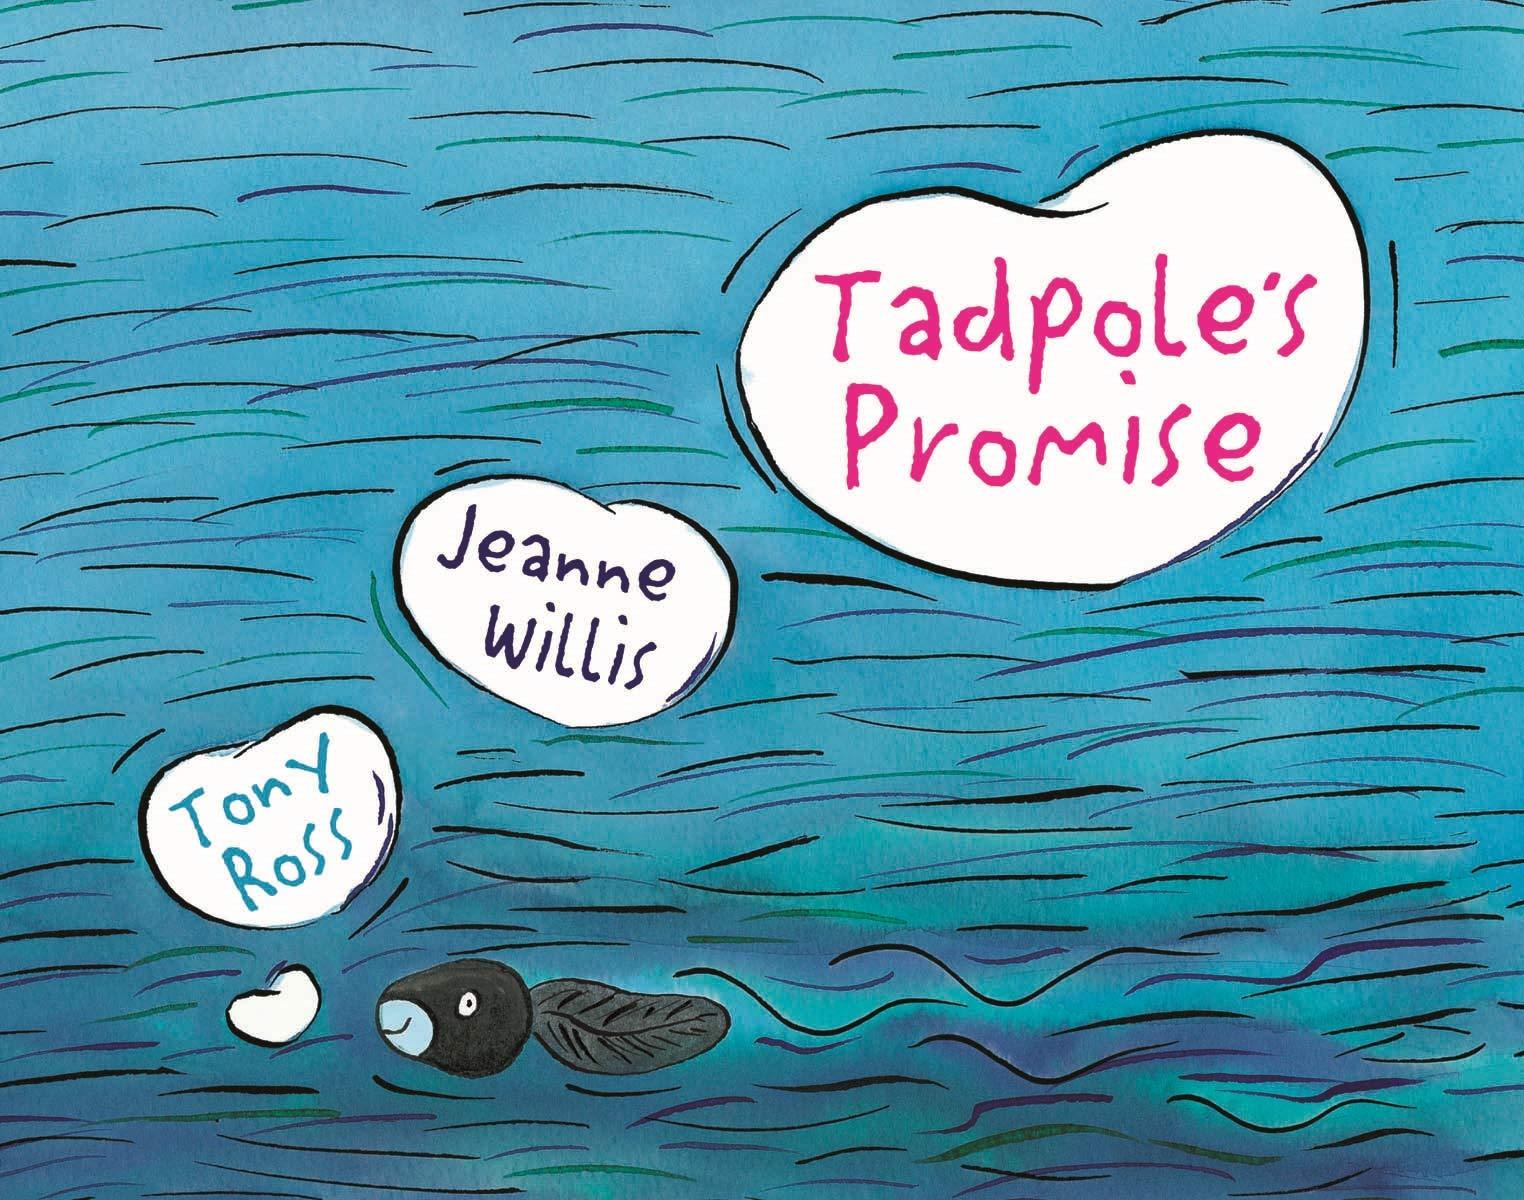 Tadpole's Promise: Amazon.co.uk: Jeanne Willis, Tony Ross: Books